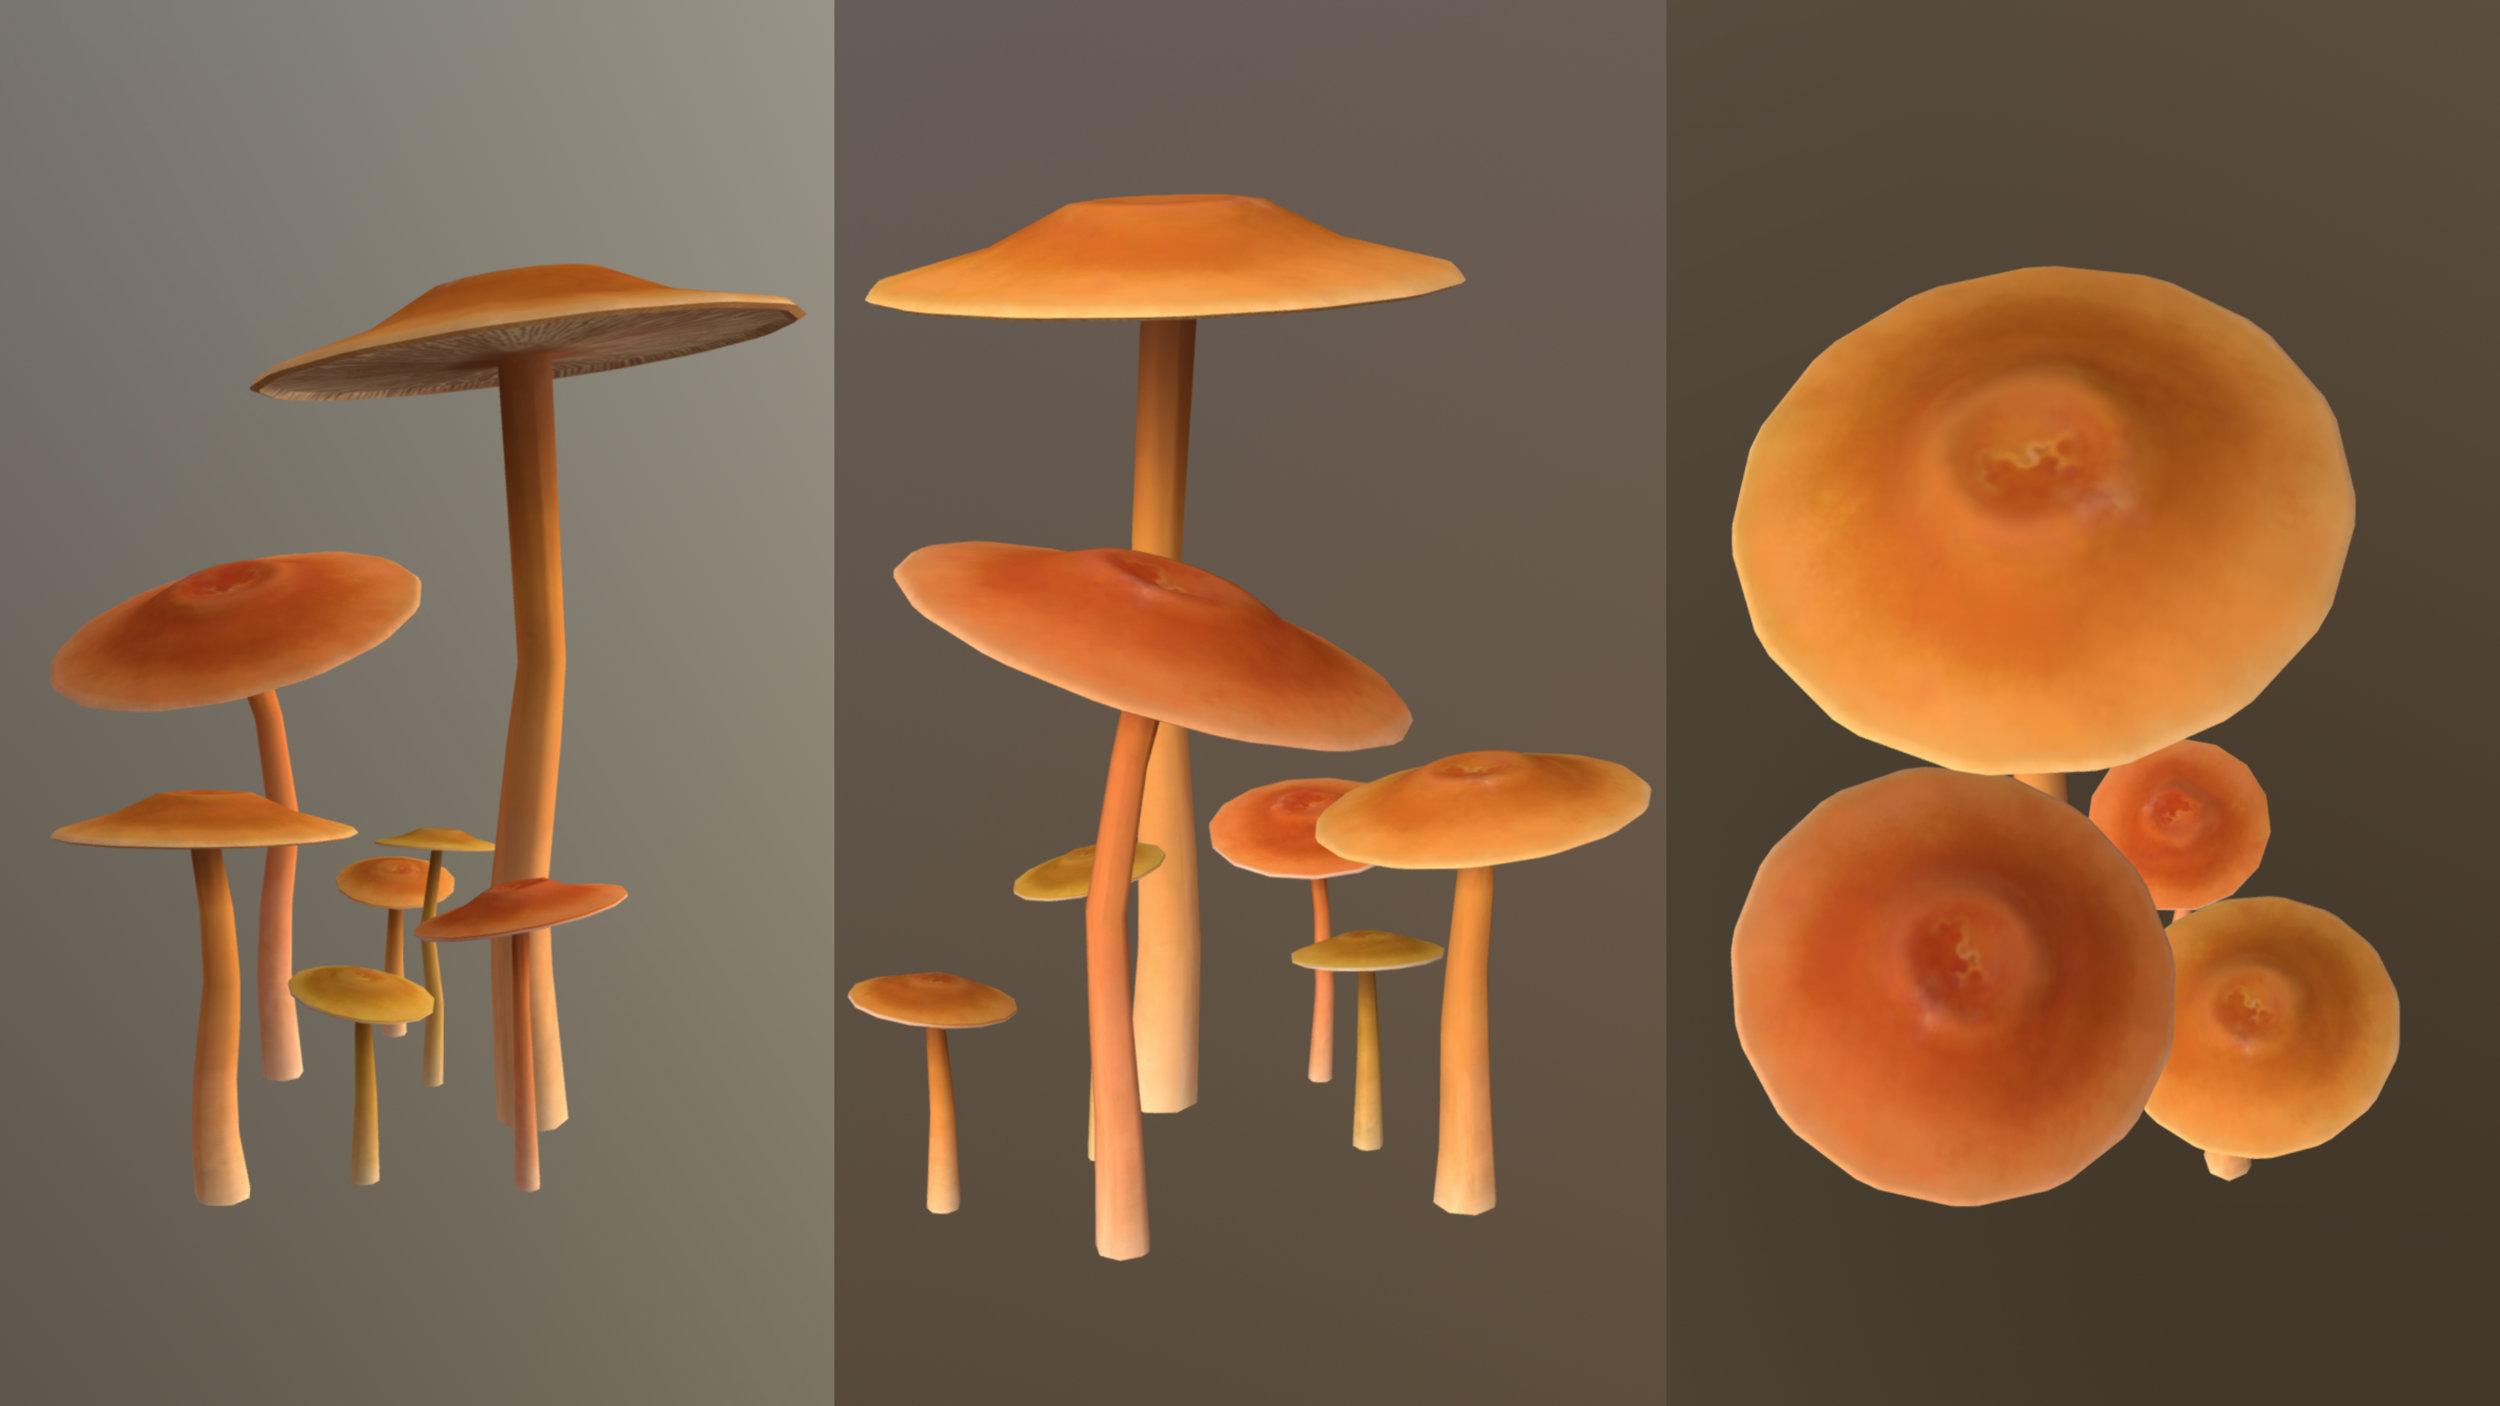 Qspence_Mushrooms.jpg